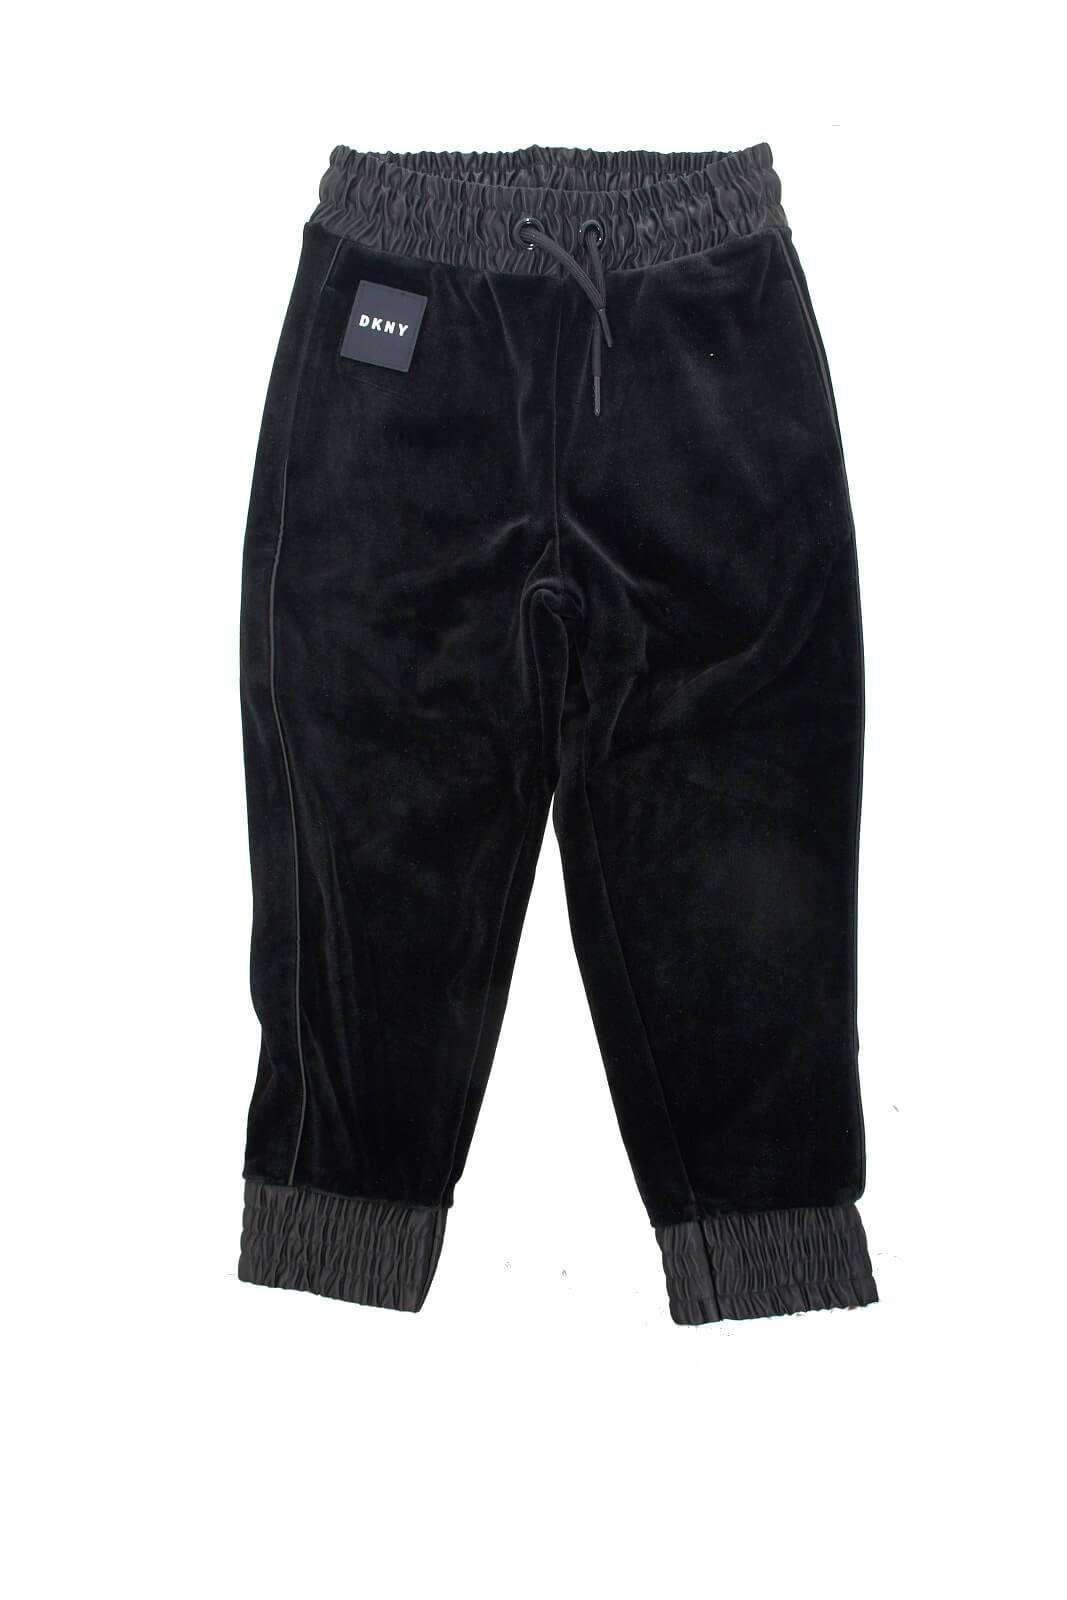 AI outlet parmax pantaloni bambina dkny D34962 A